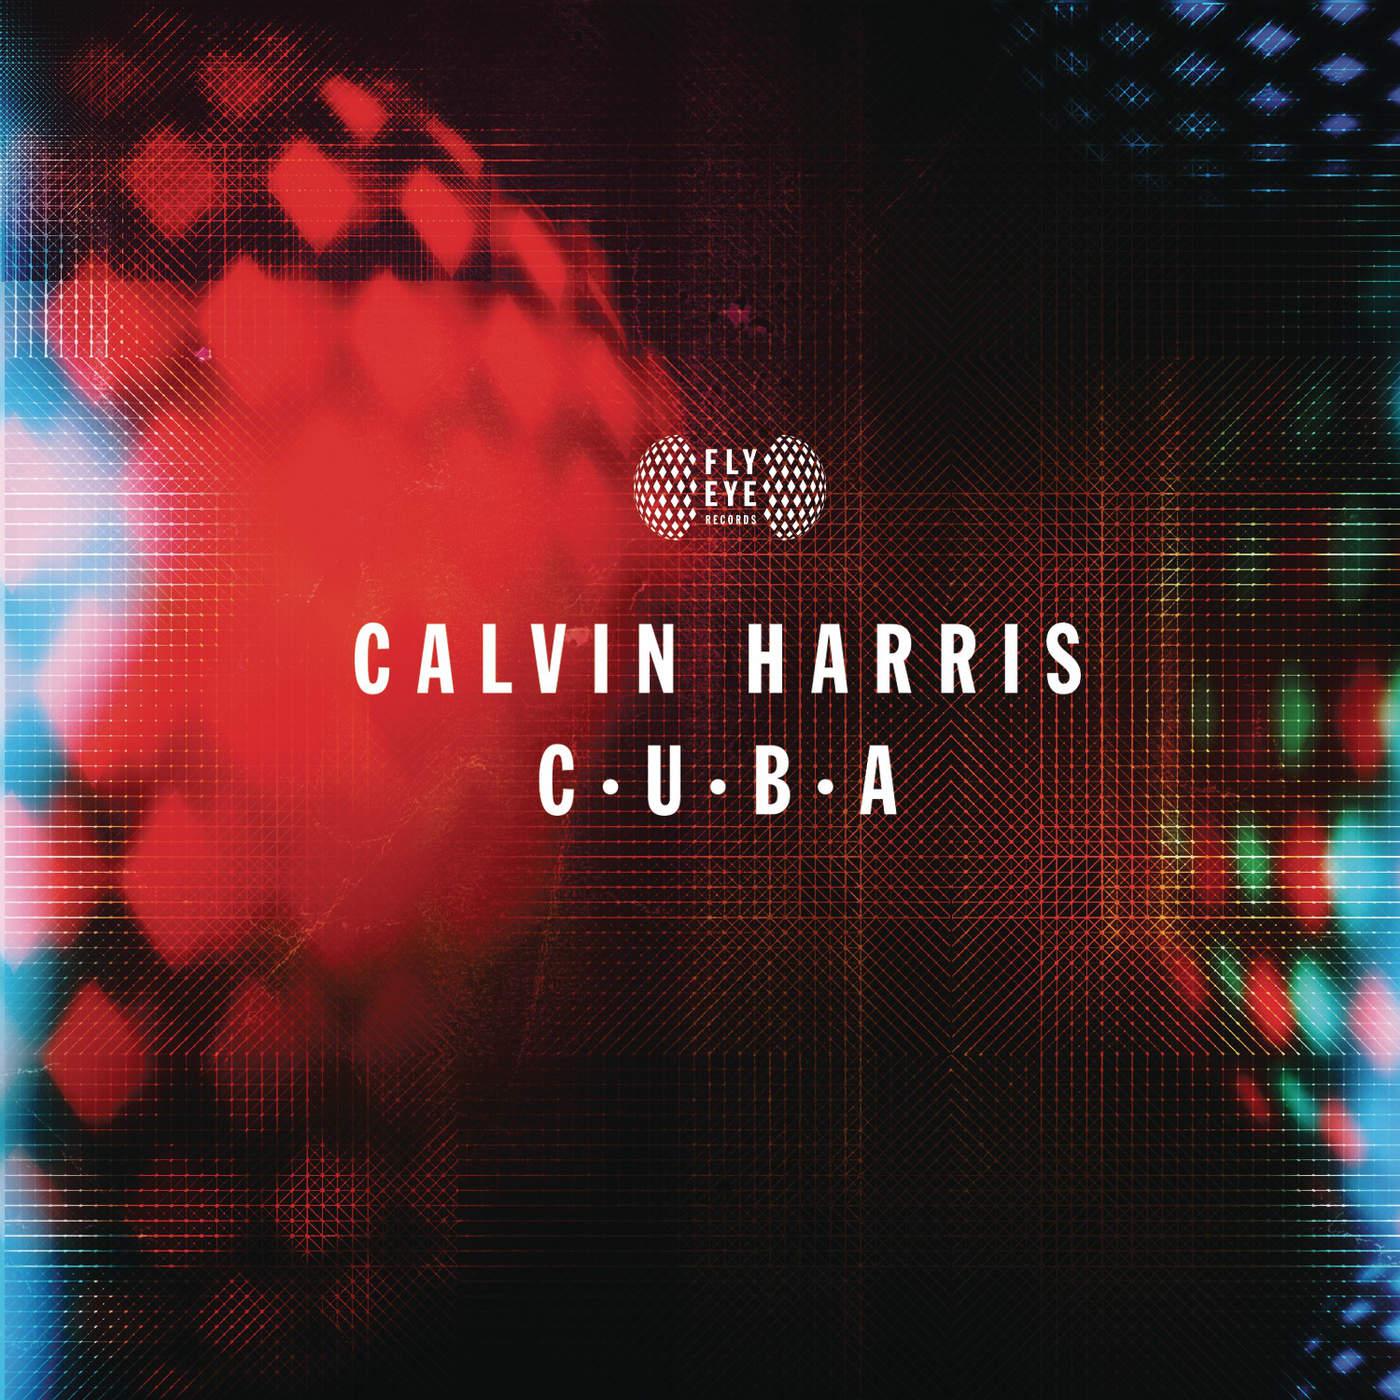 Calvin Harris - C.U.B.A - Single Cover